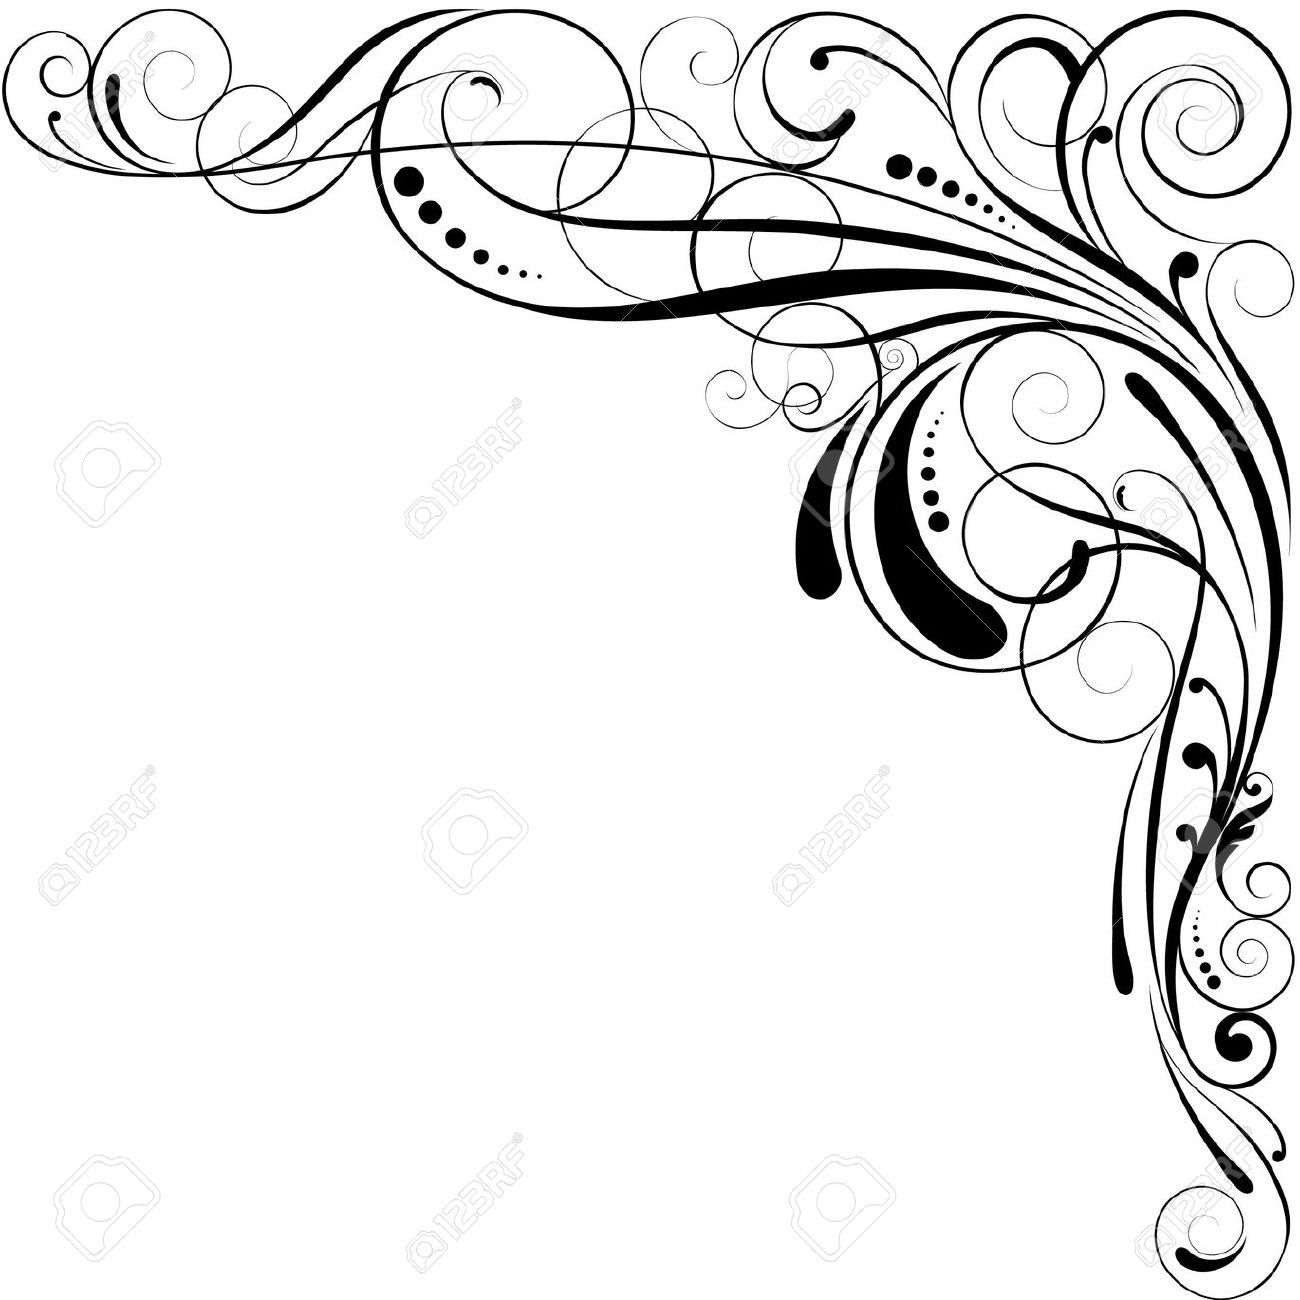 Image result for line designs swirls graphic design pinterest image result for line designs swirls stopboris Choice Image